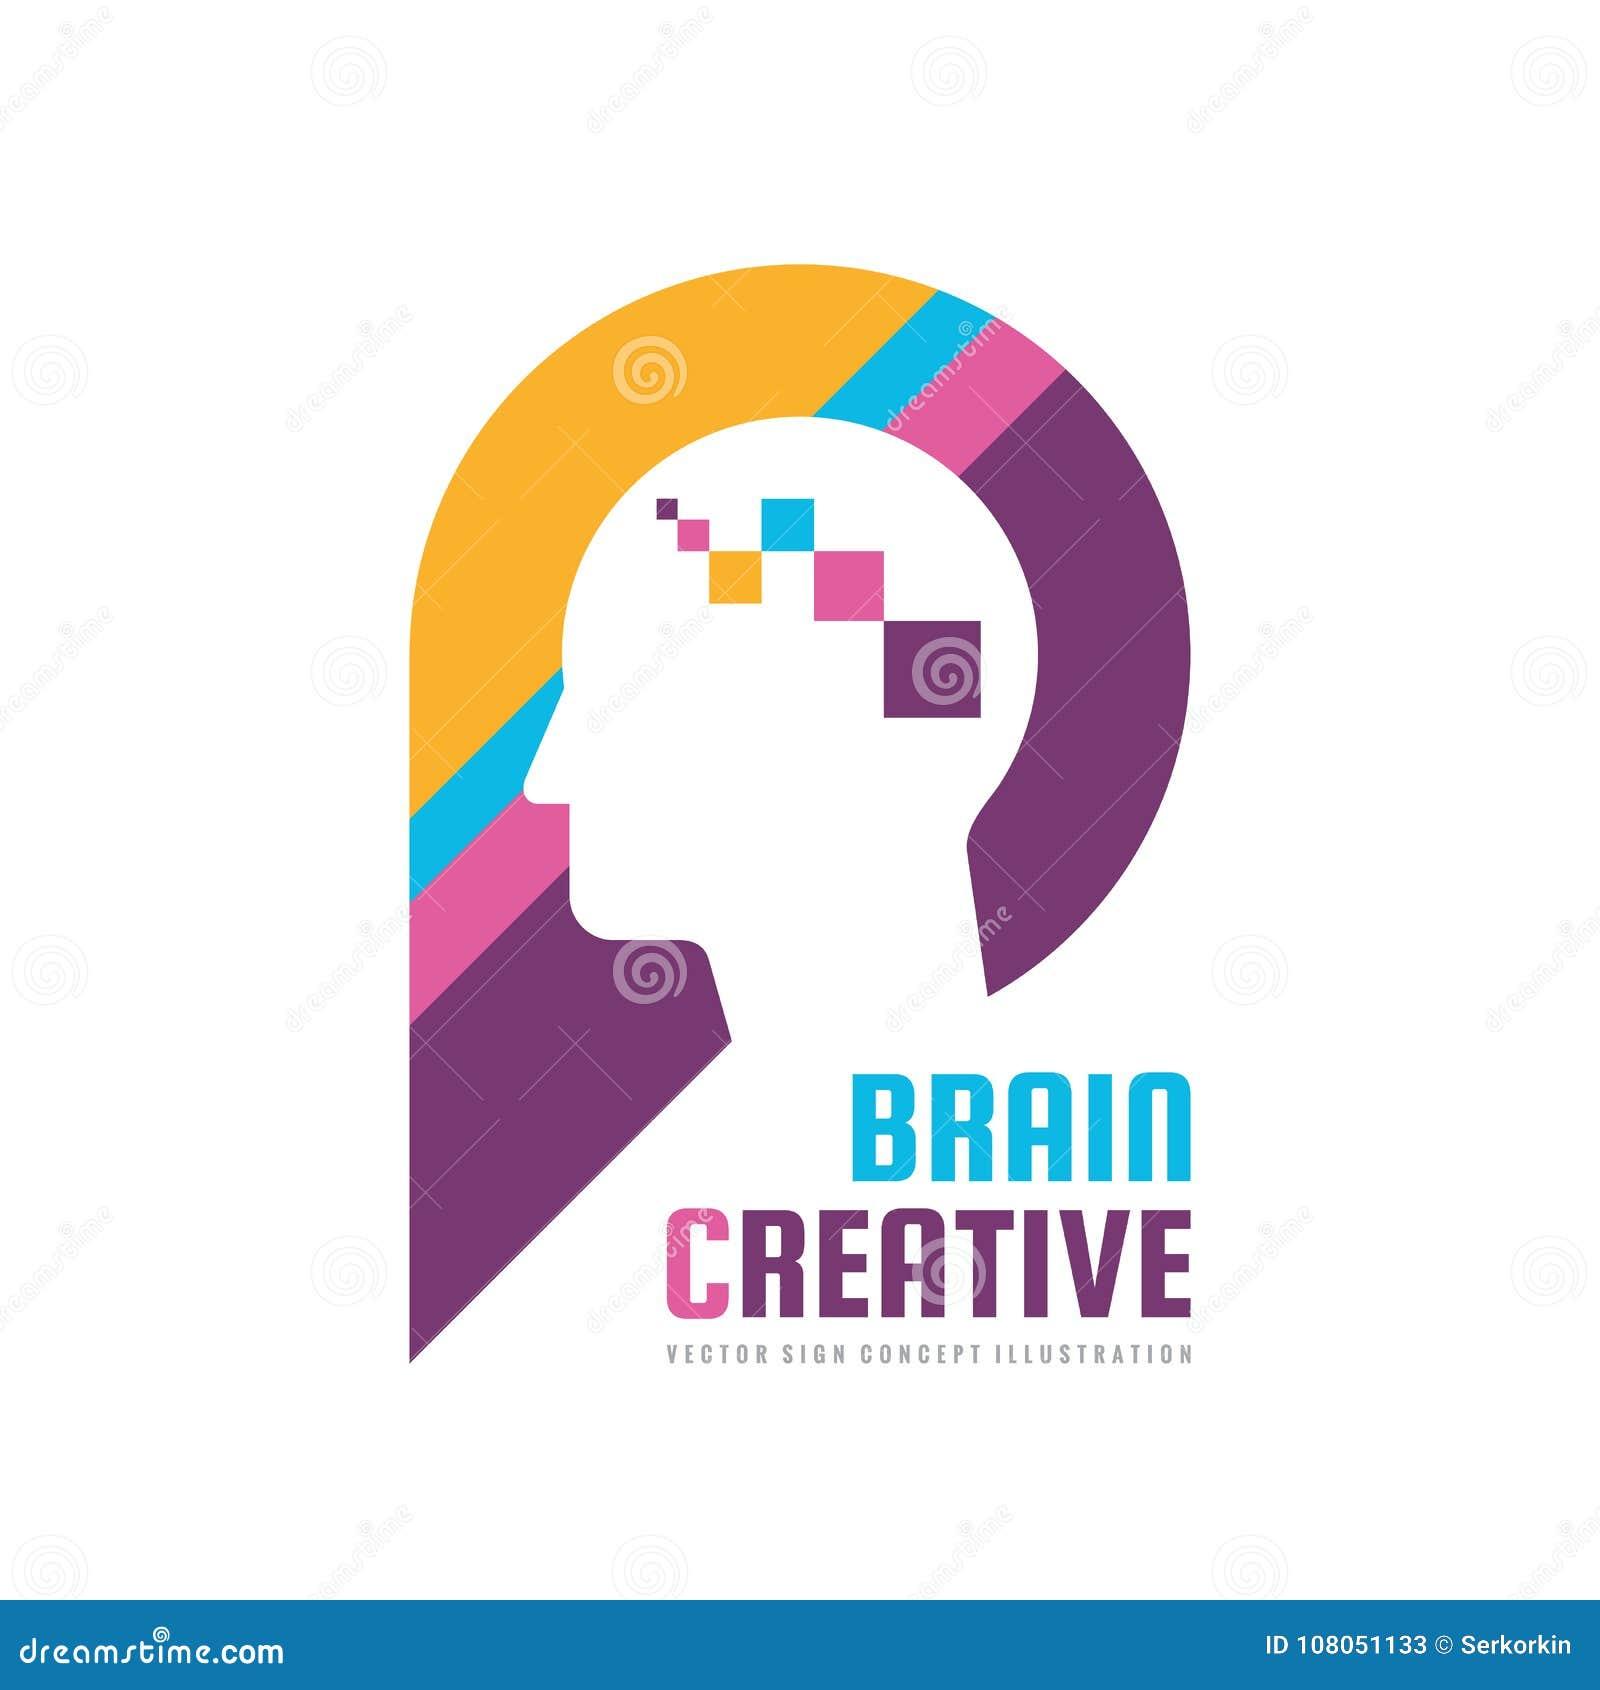 Brain Creative - Concept Logo Template Vector Illustration